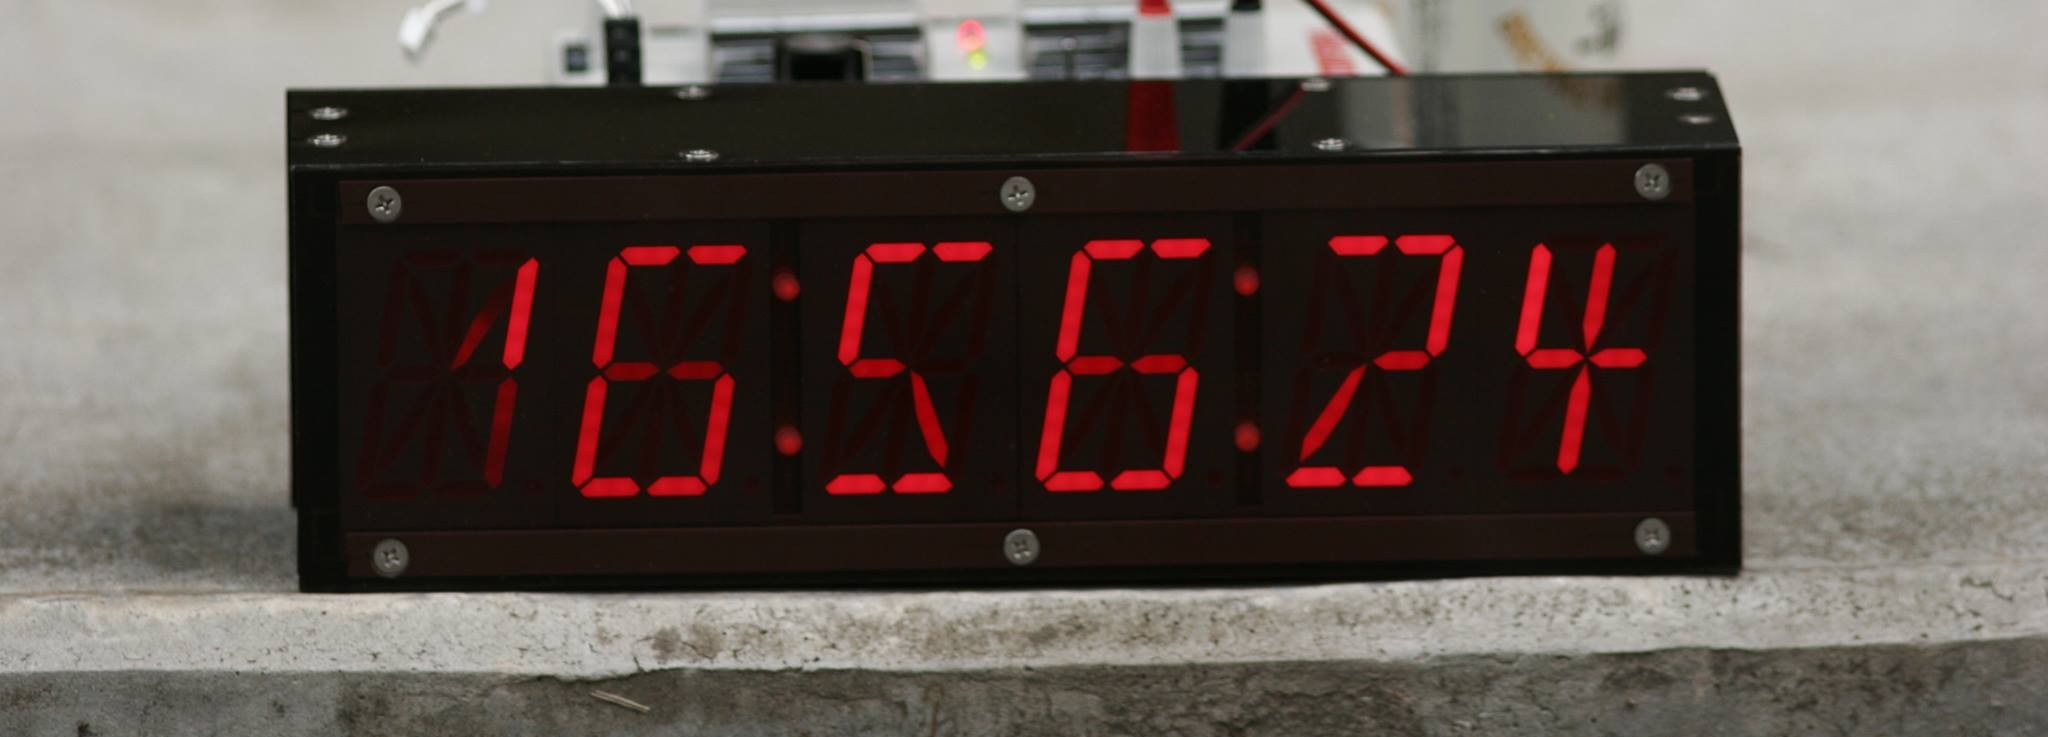 Big 16 Segments LED GPS Clock